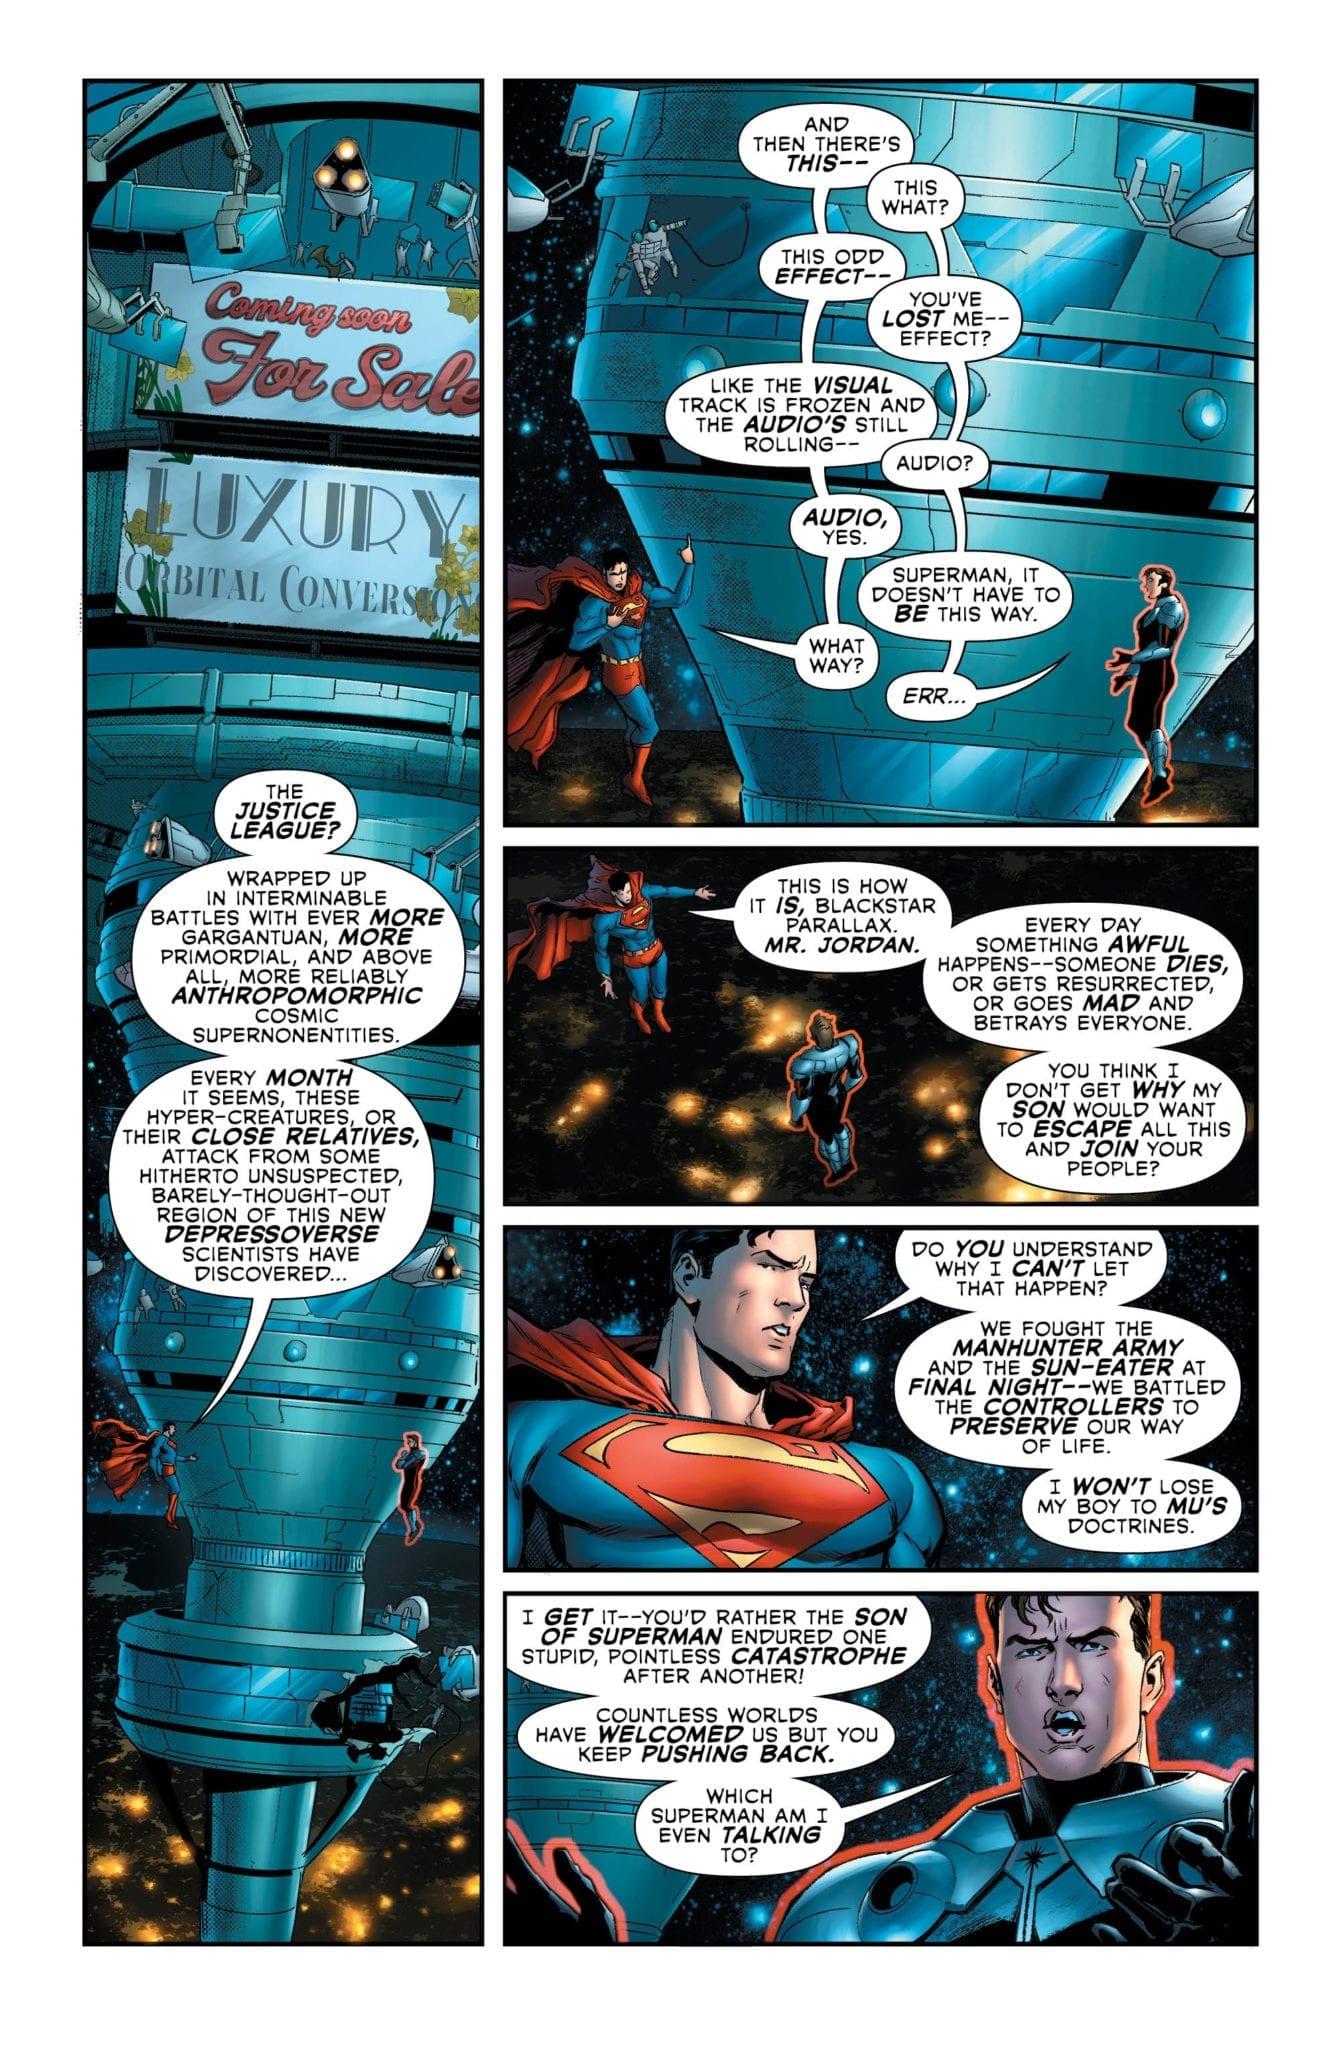 Superman speaks with Blackstar Parallax